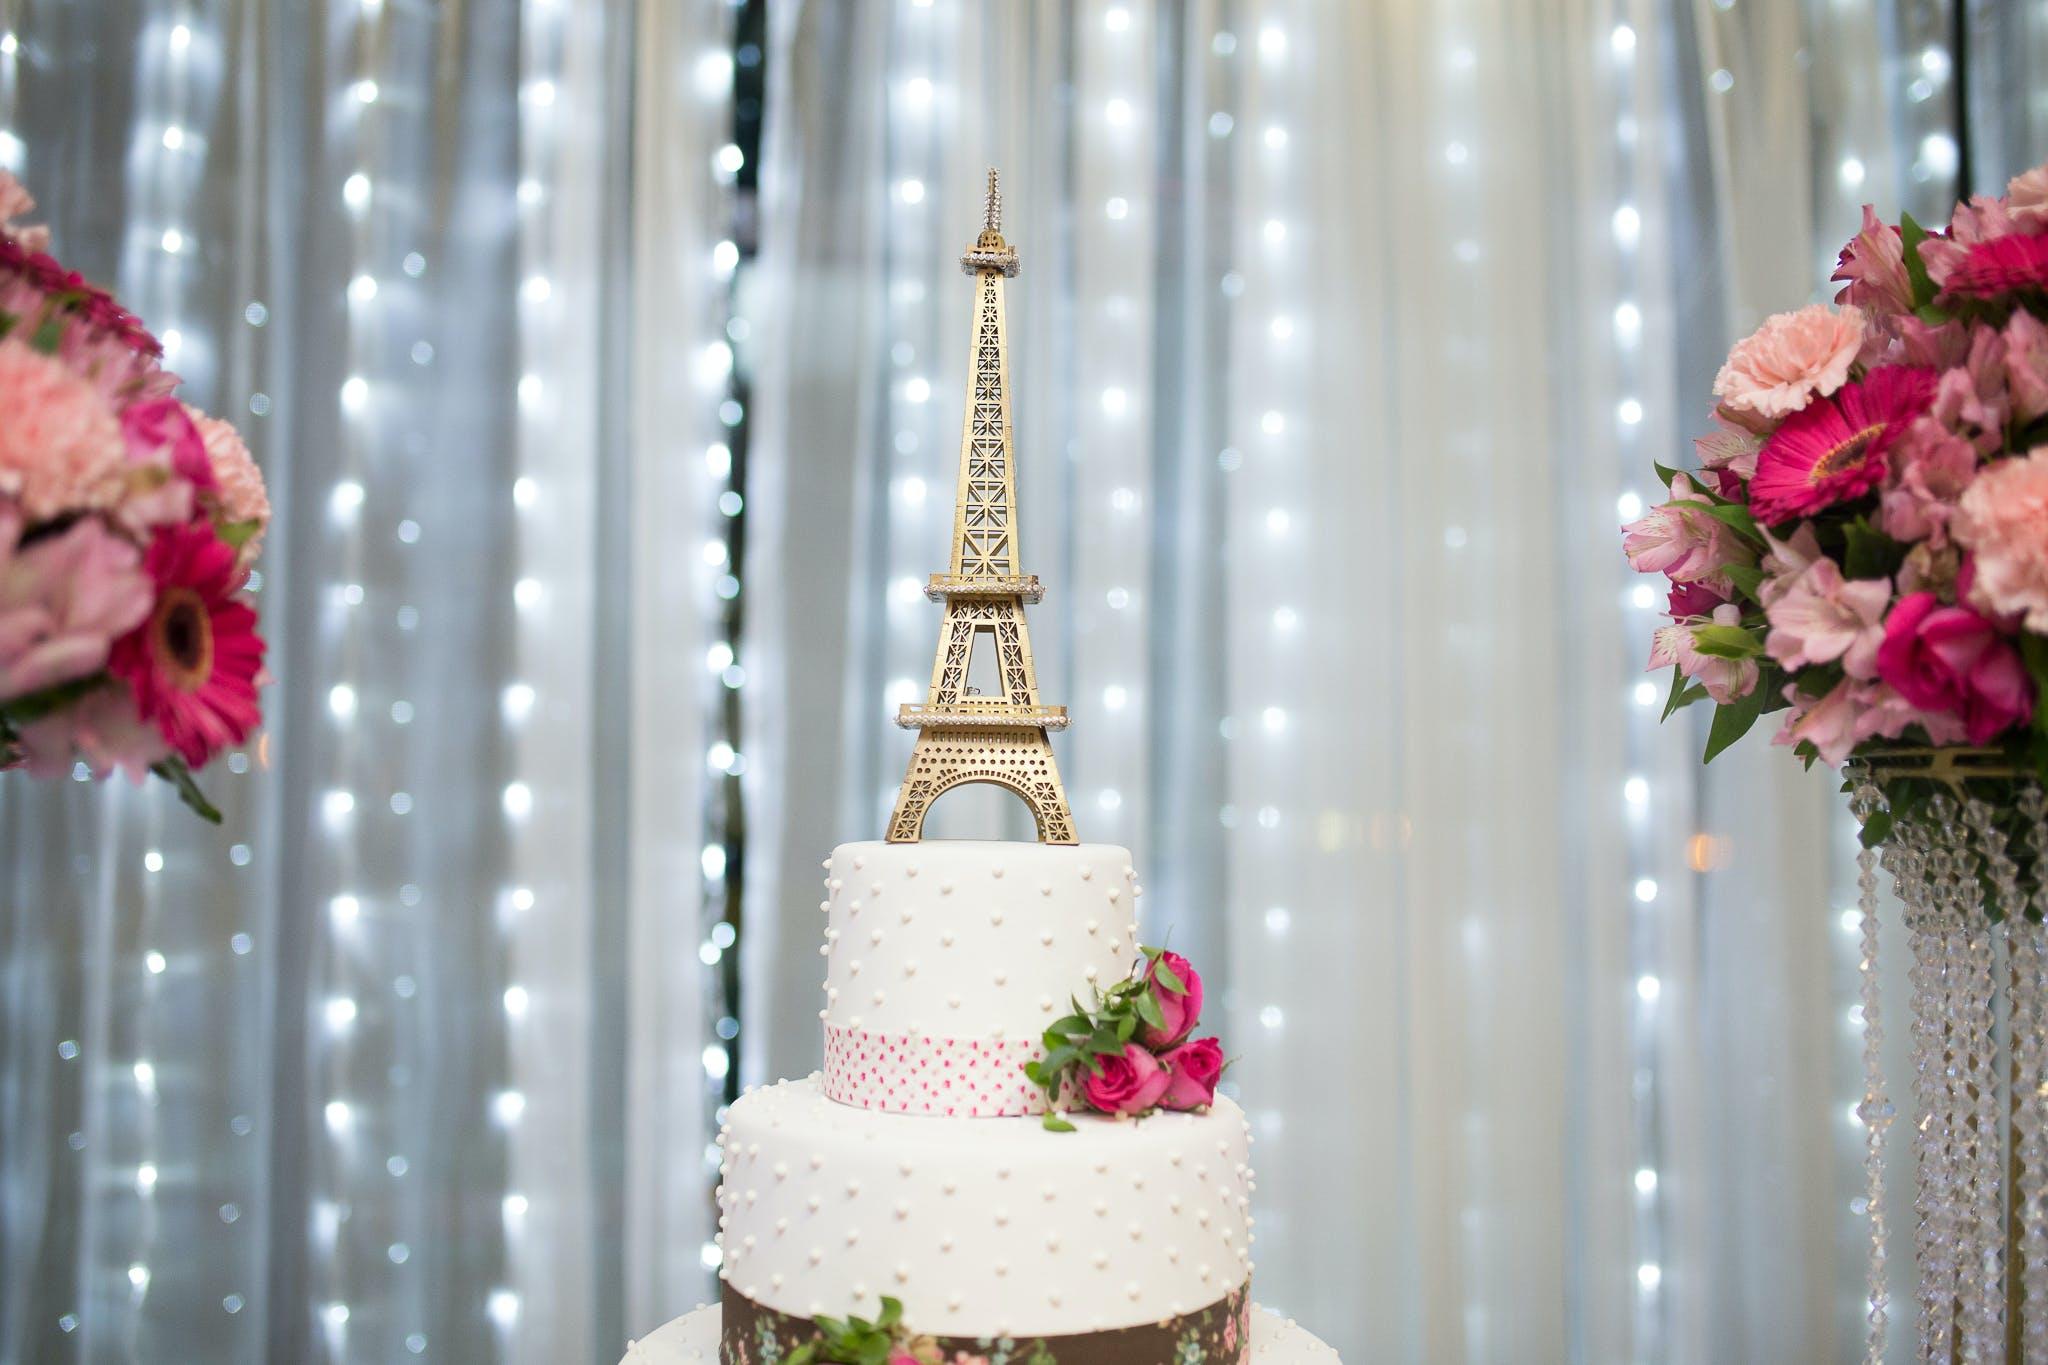 Free stock photo of lights, wedding, decor, decorate